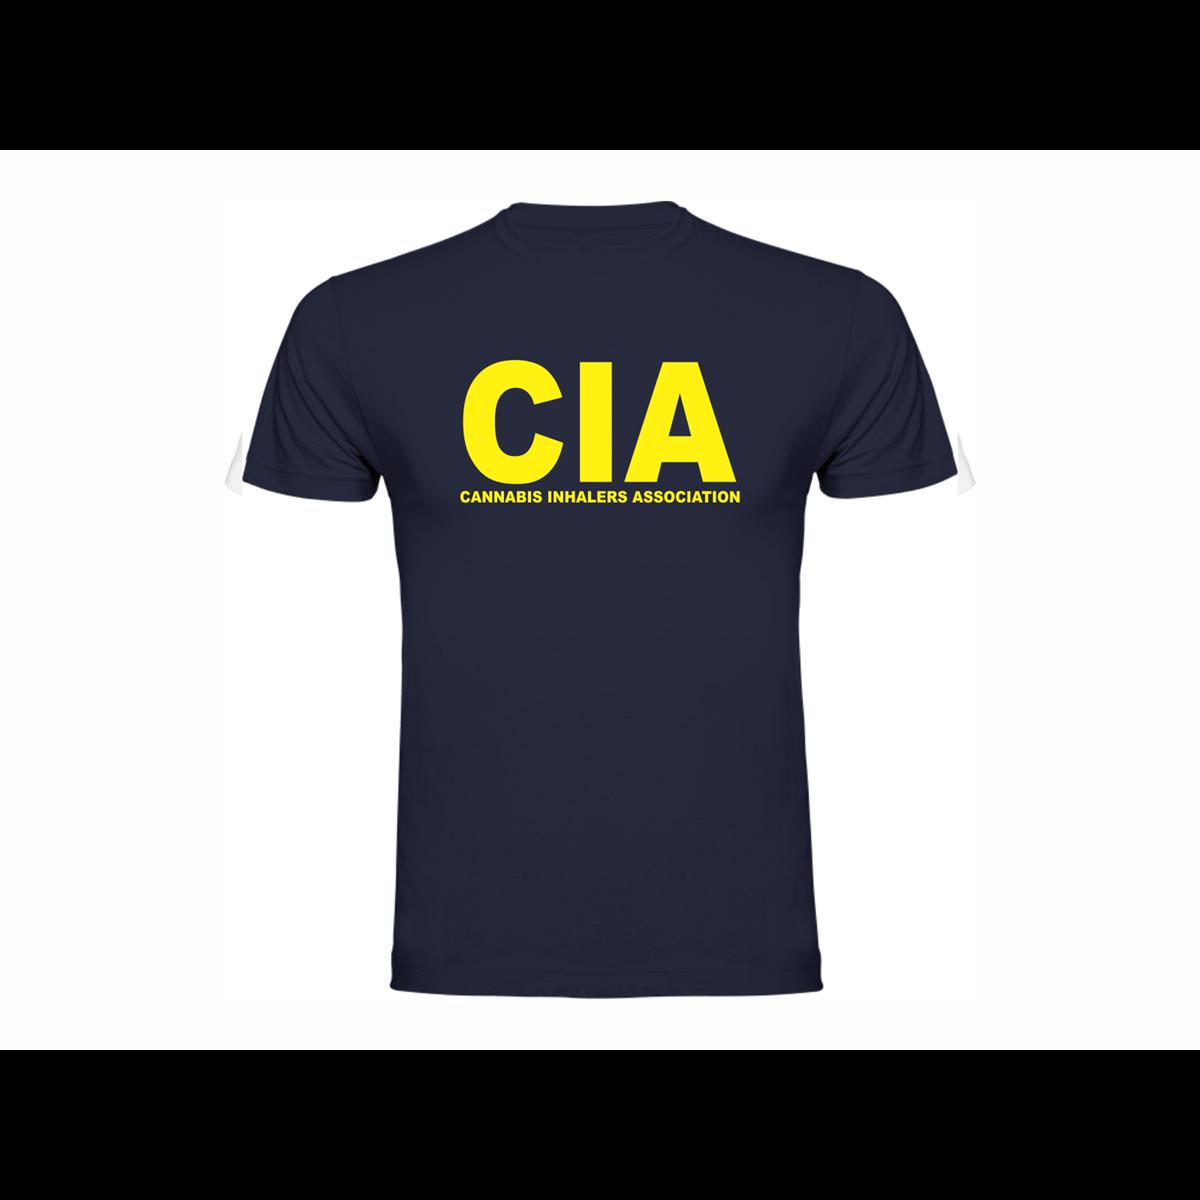 Shirt Funny T Shirts Cool T Shirts Design Your Own Tshirt Custom